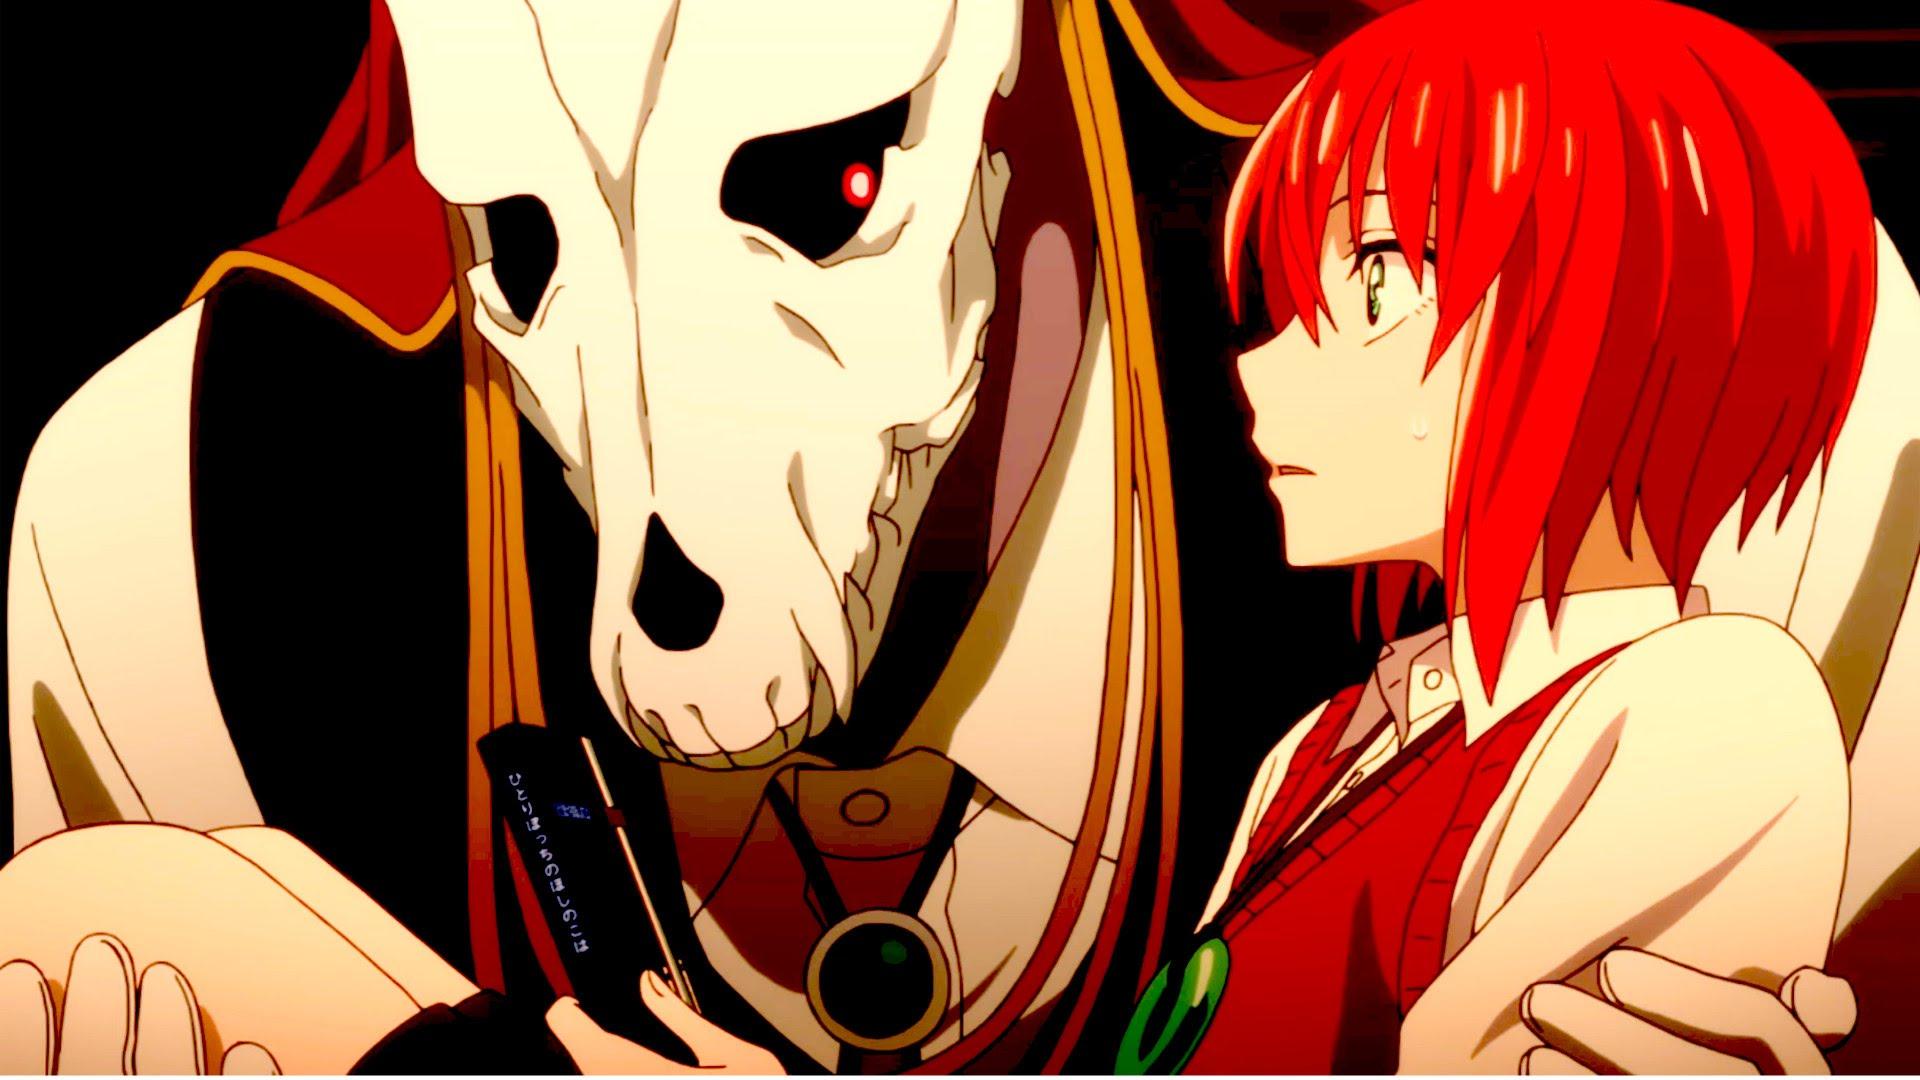 Mahoutsukai no yome 01 - Imagens em hd de animes ...